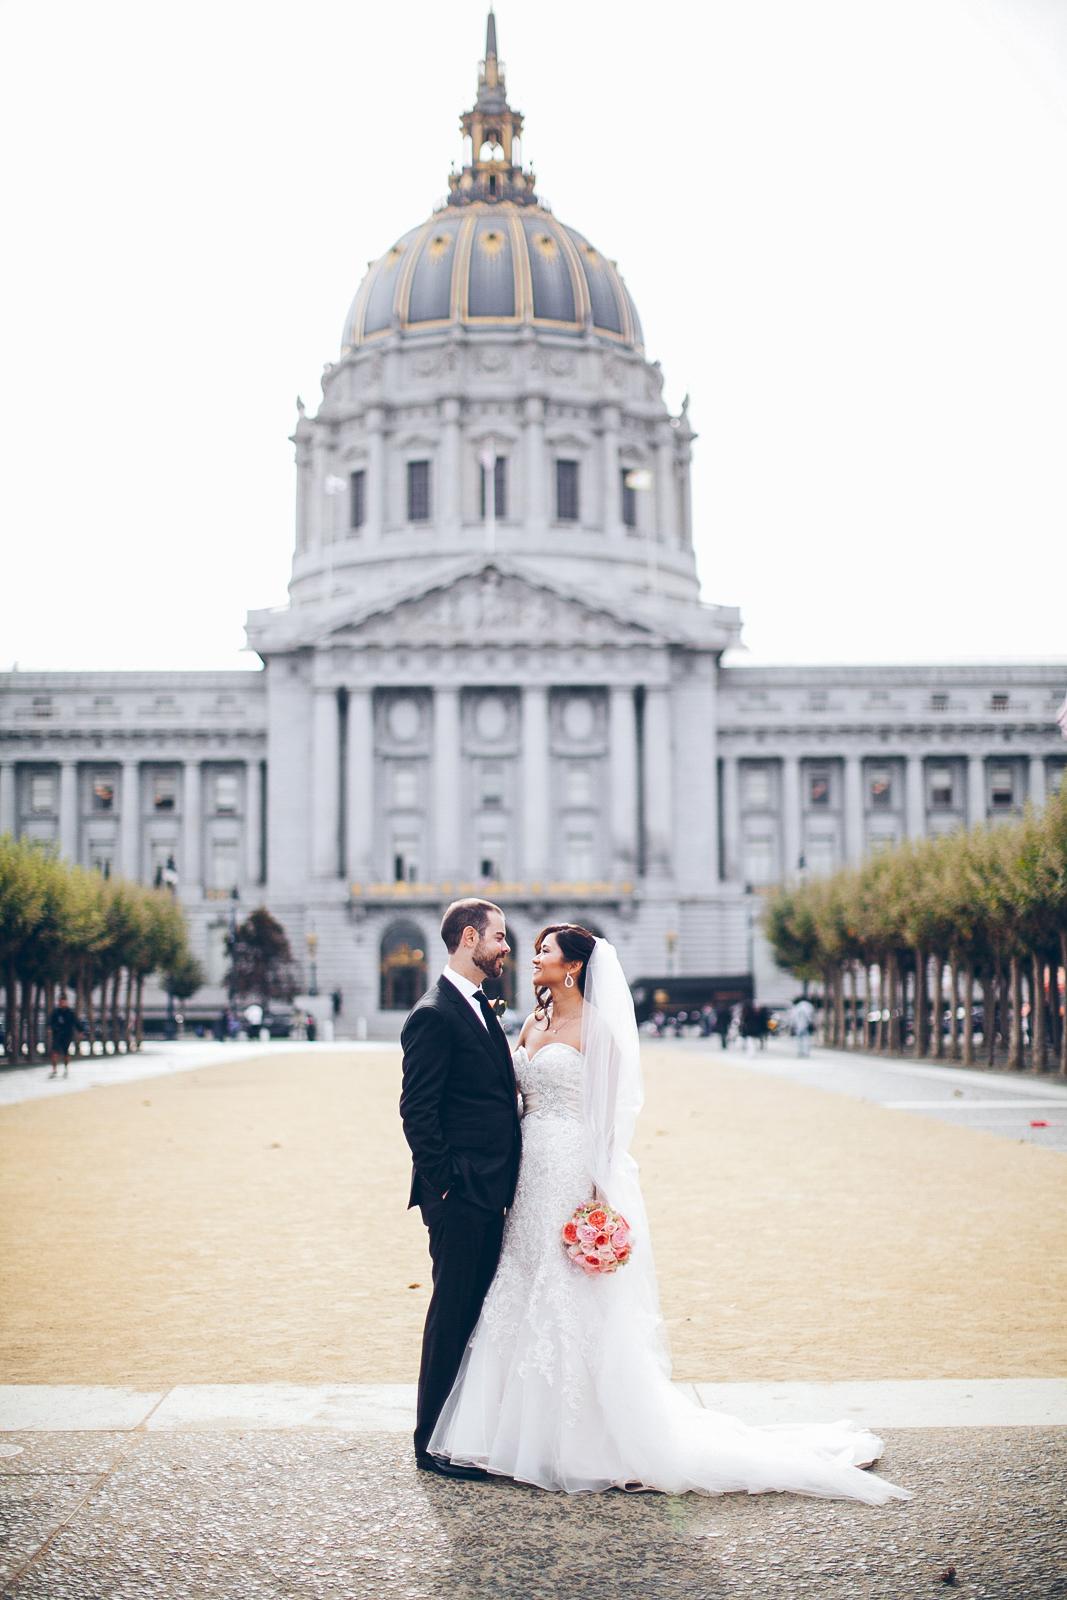 San_francisco_city_hall_wedding_photography_meegan_travis_ebony_siovhan_bokeh_photography_62.jpg